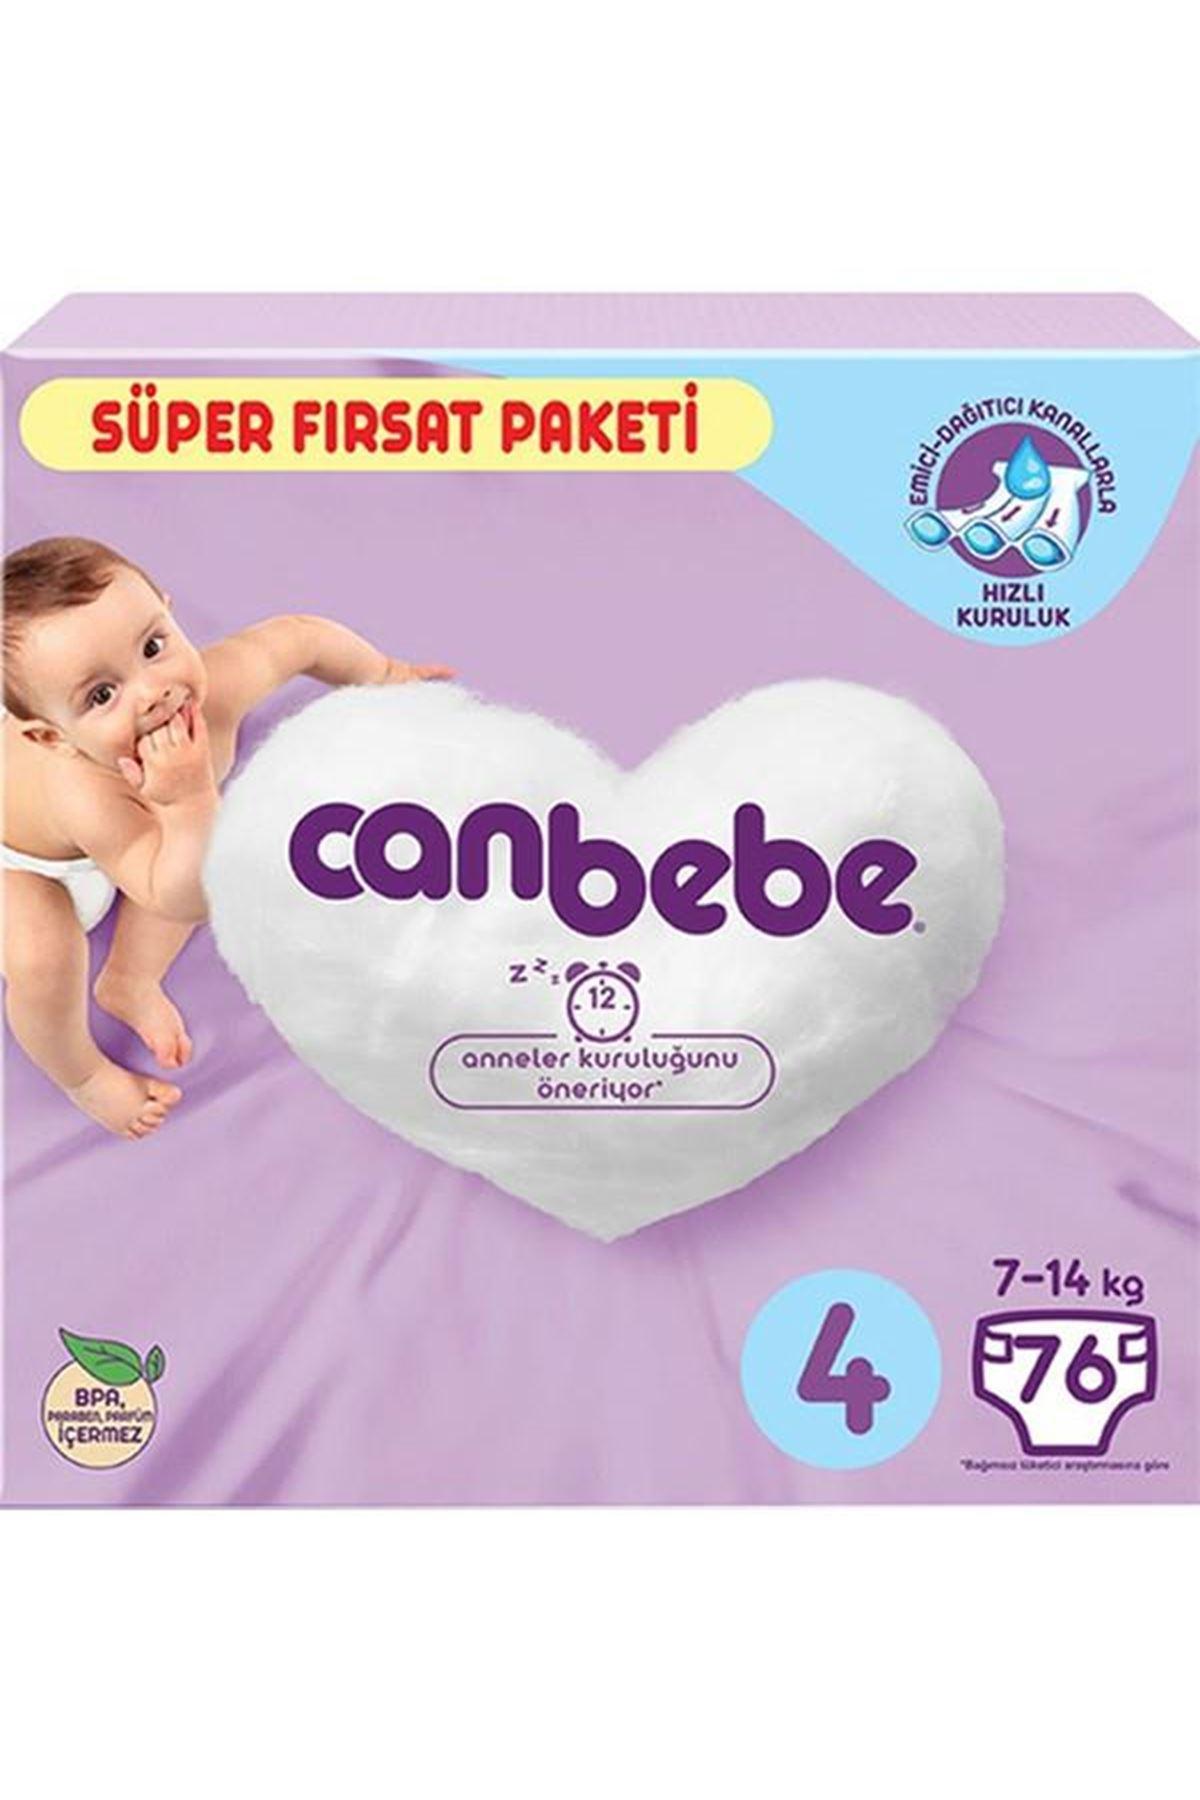 Canbebe Bebek Bezi Süper Fırsat Paketi 4 Beden 7-14 Kg 76 Adet